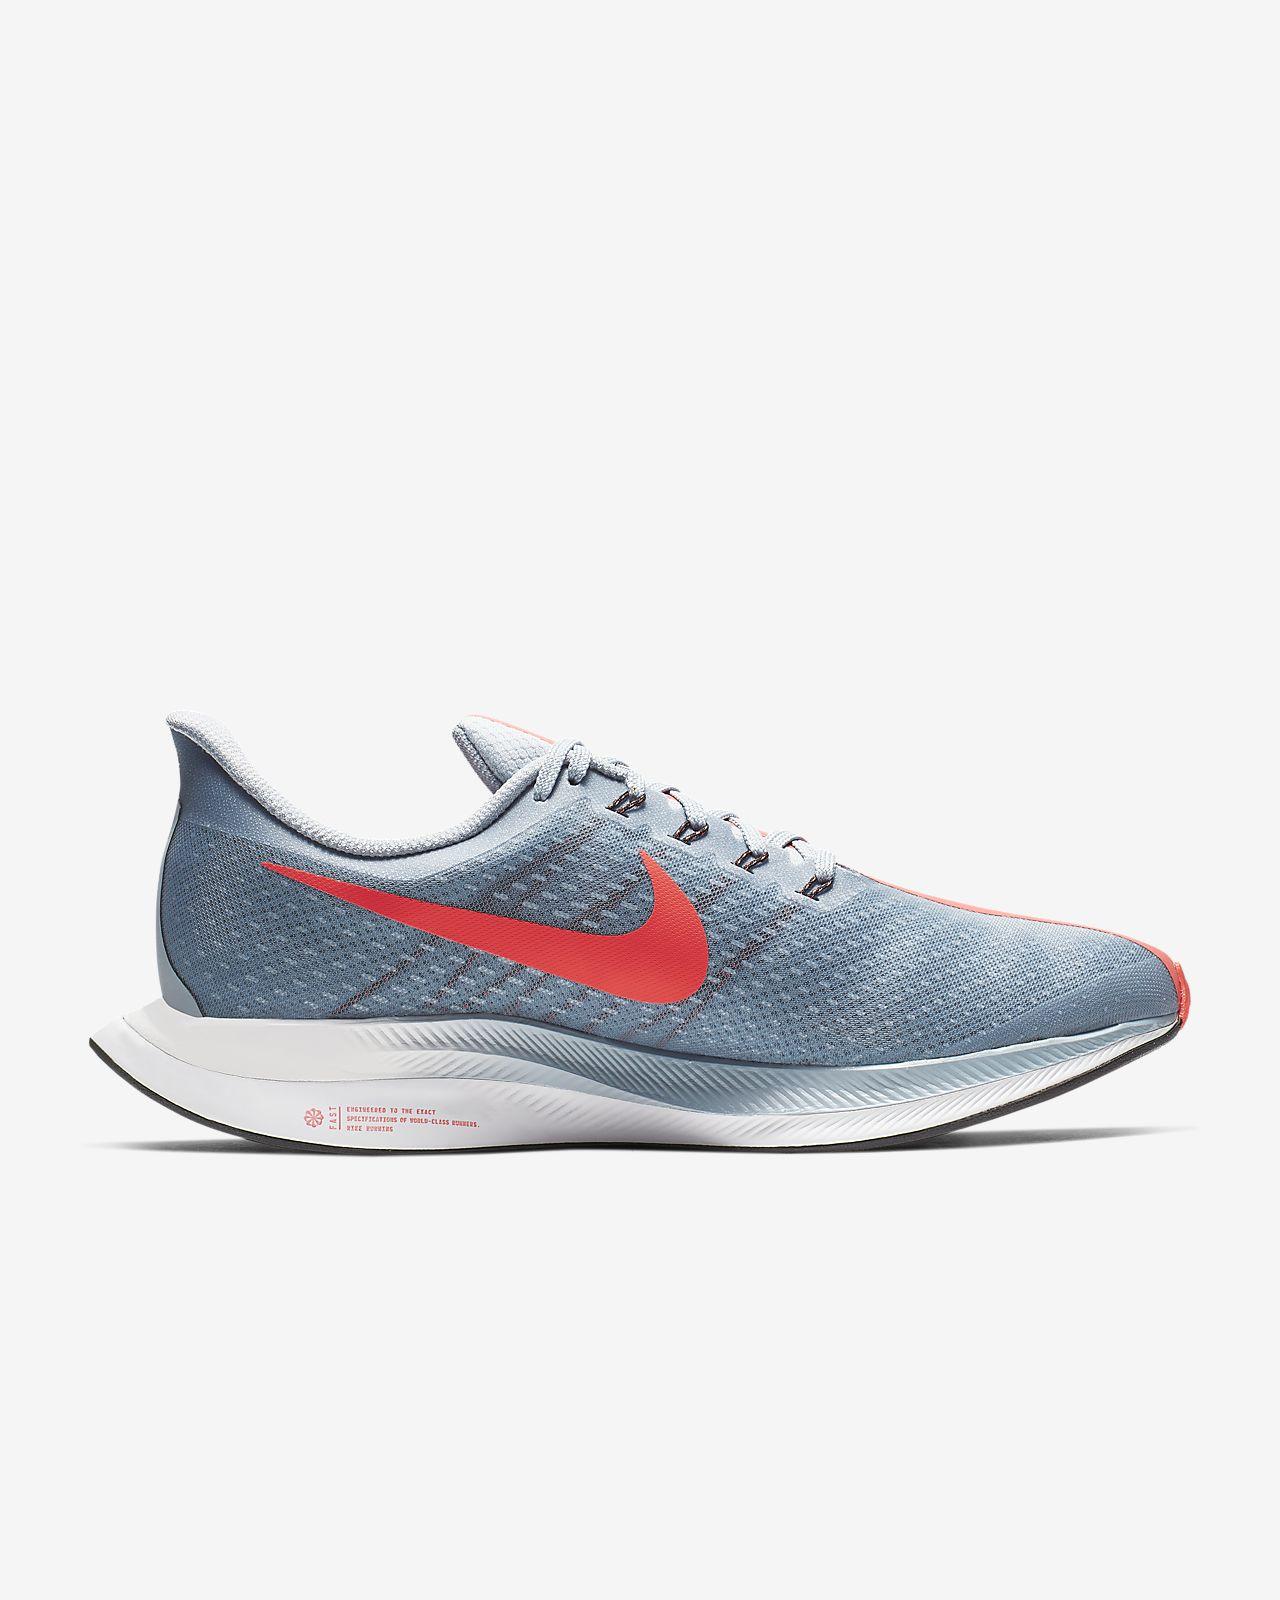 04205aa5f1f Nike Zoom Pegasus Turbo Hardloopschoen voor heren. Nike.com BE